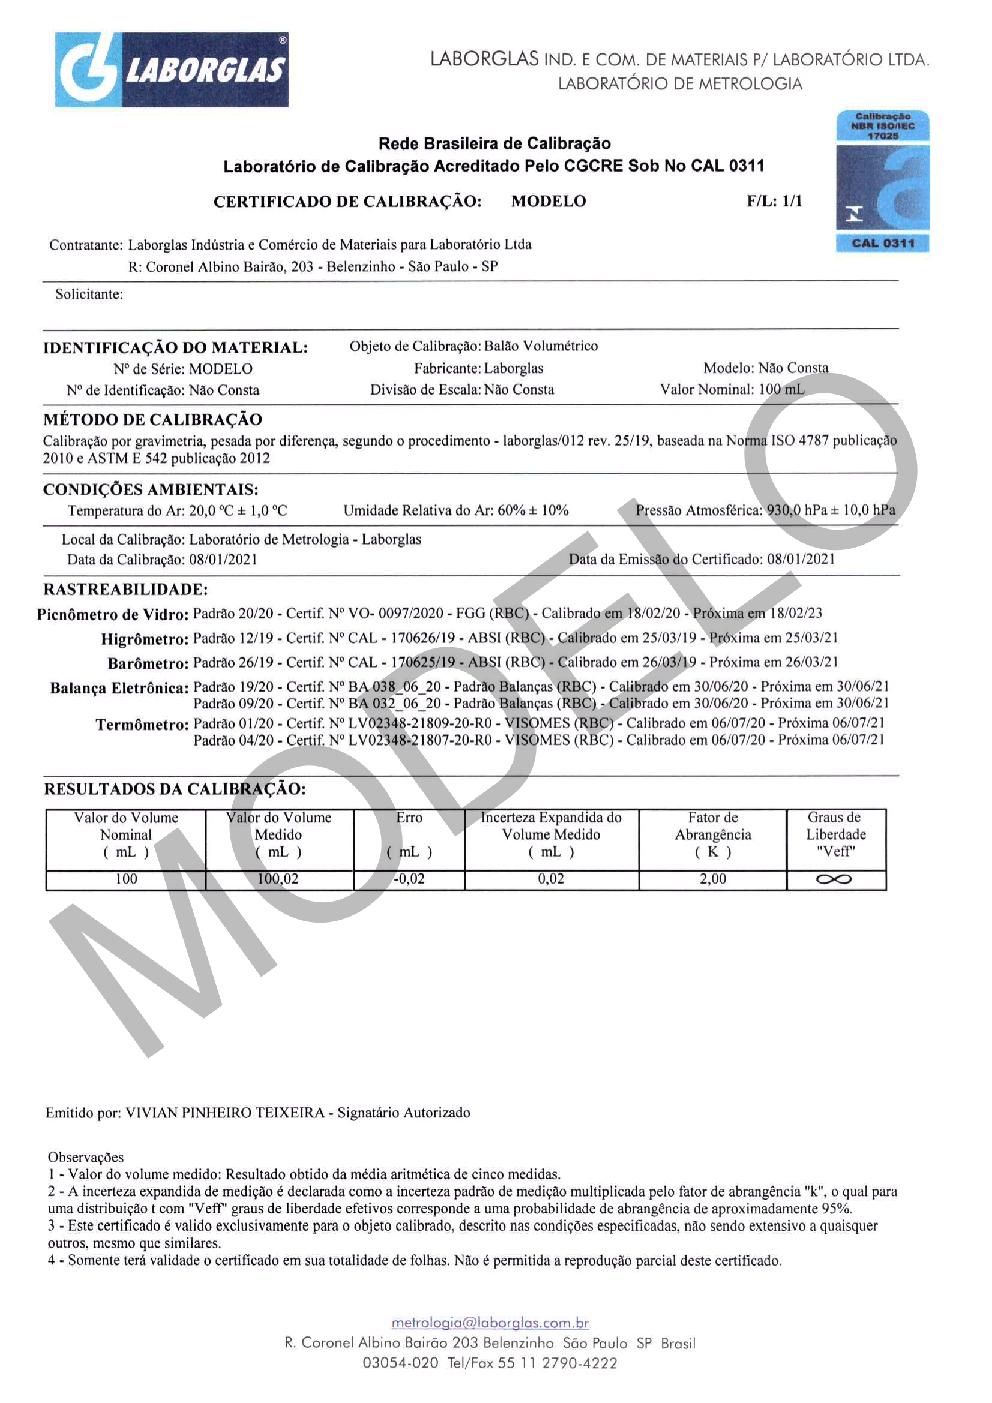 BALÃO VOLUMÉTRICO CLASSE A ROLHA POLI ÂMBAR C/ CERTIFICADO RBC 250 ML - Marca Laborglas - Cód. 91678366-R